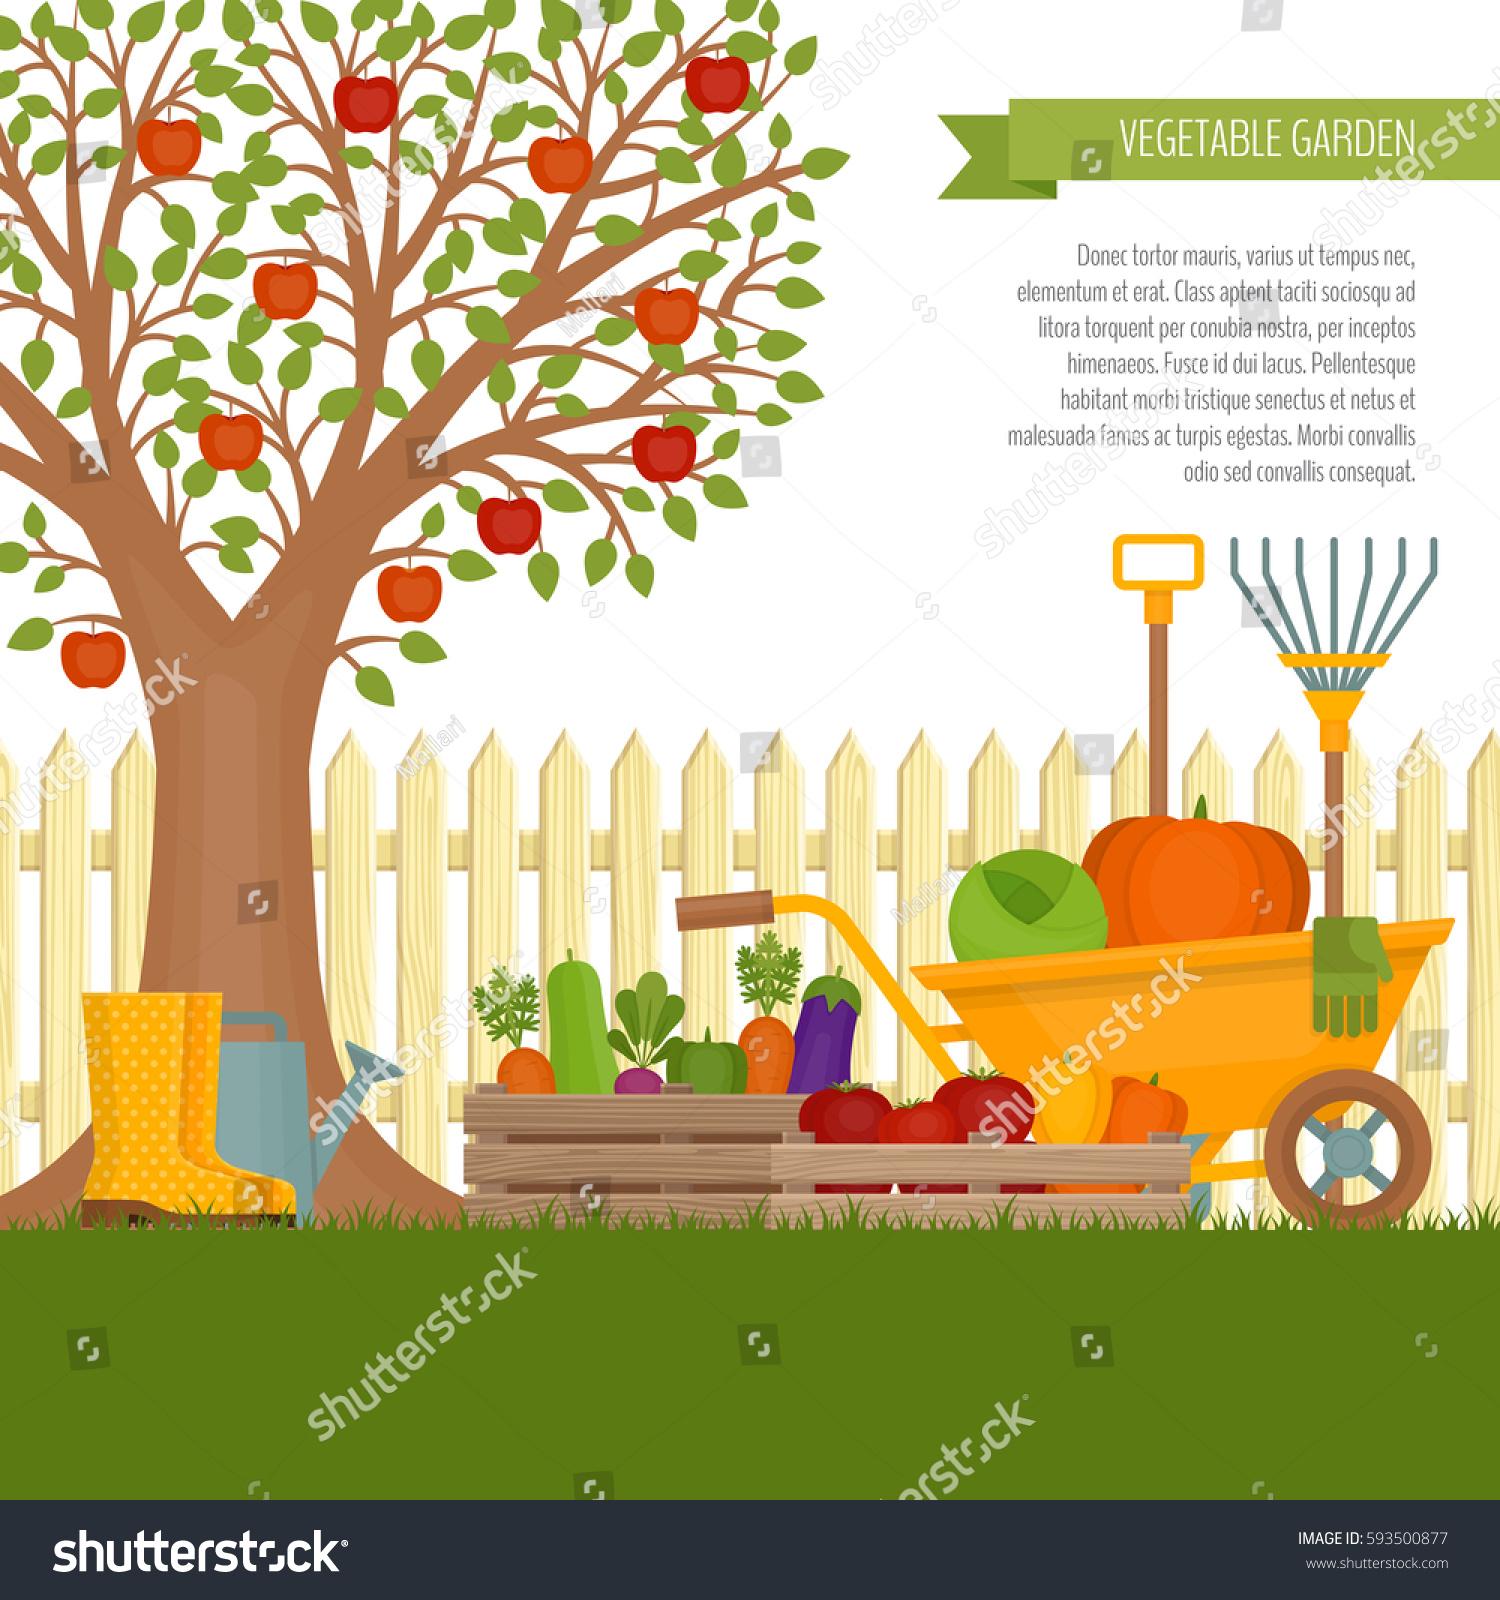 Vegetable Garden Concept Gardening Banner Vegetable Stock Vector